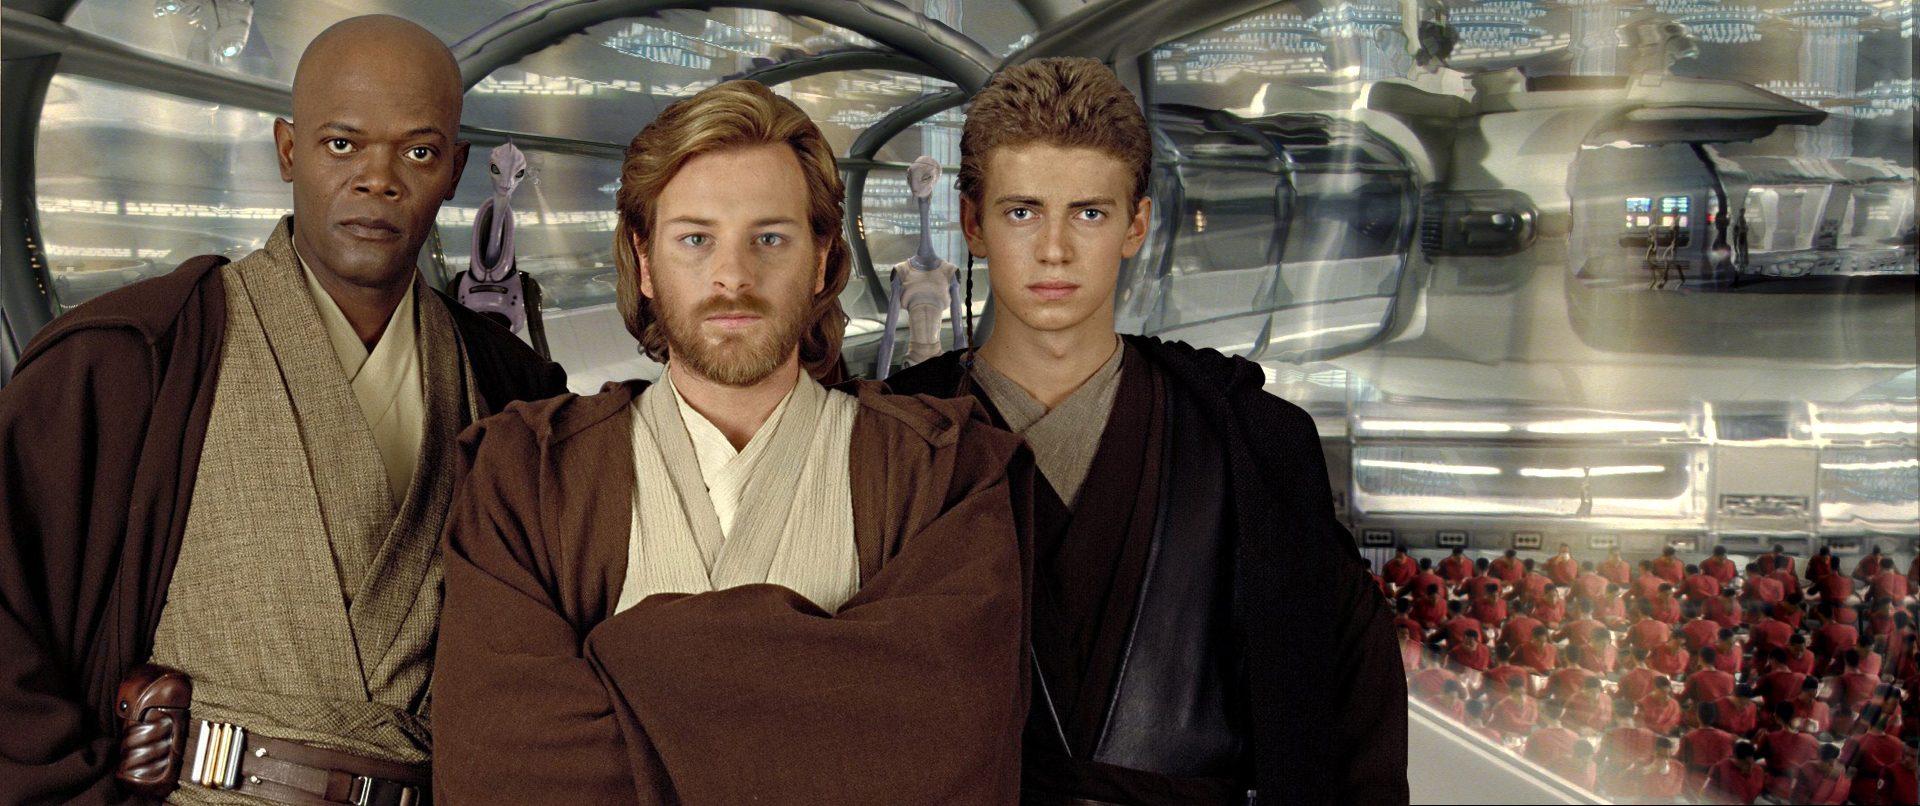 Star Wars (me as Obi Wan)